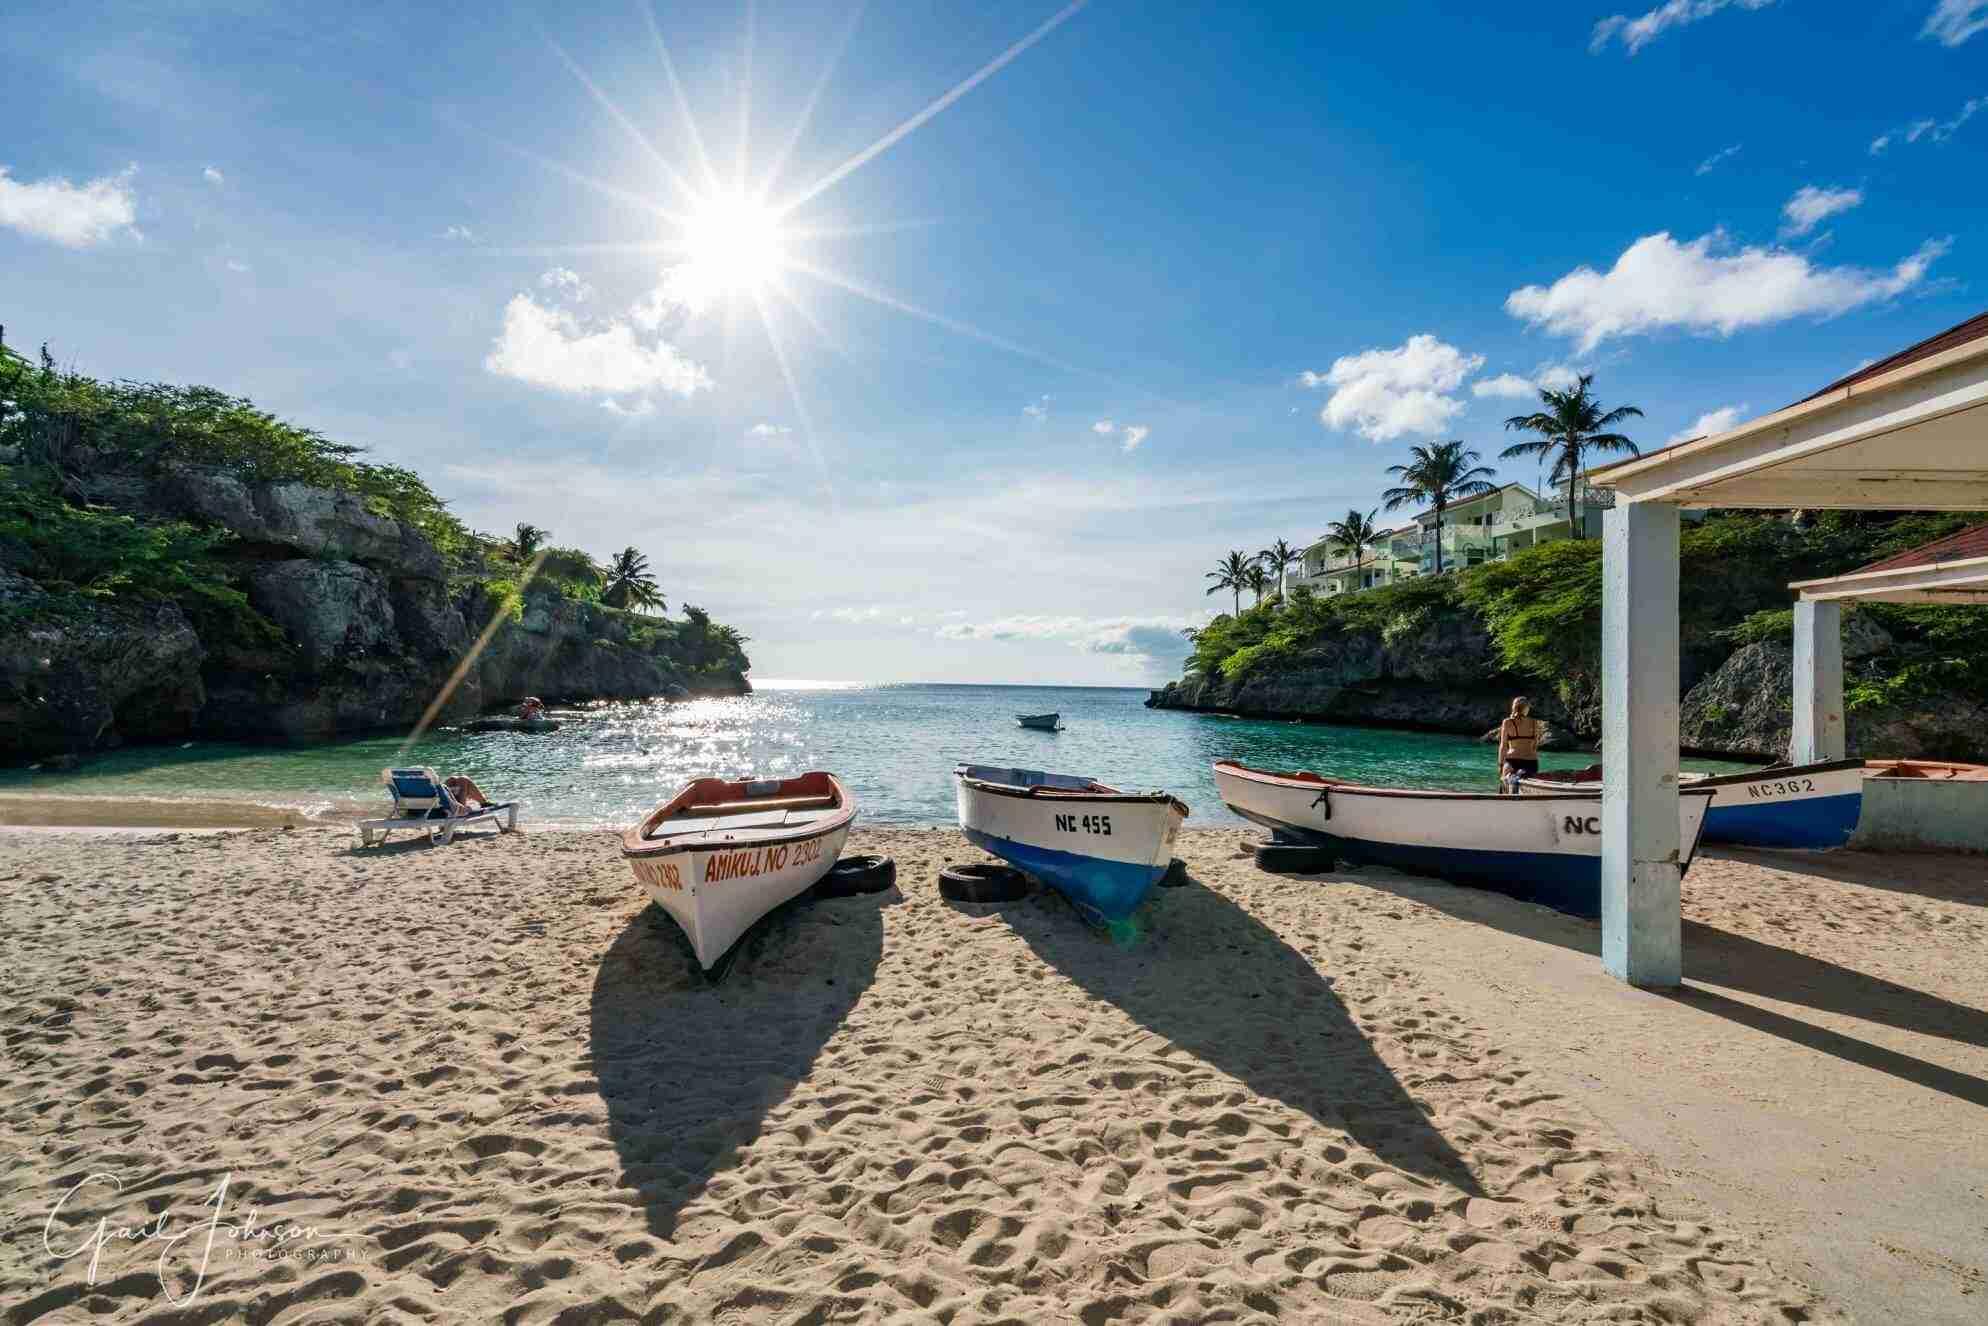 Playa Lagun | Curaçao Dive Site Guide | Dive Travel Curacao